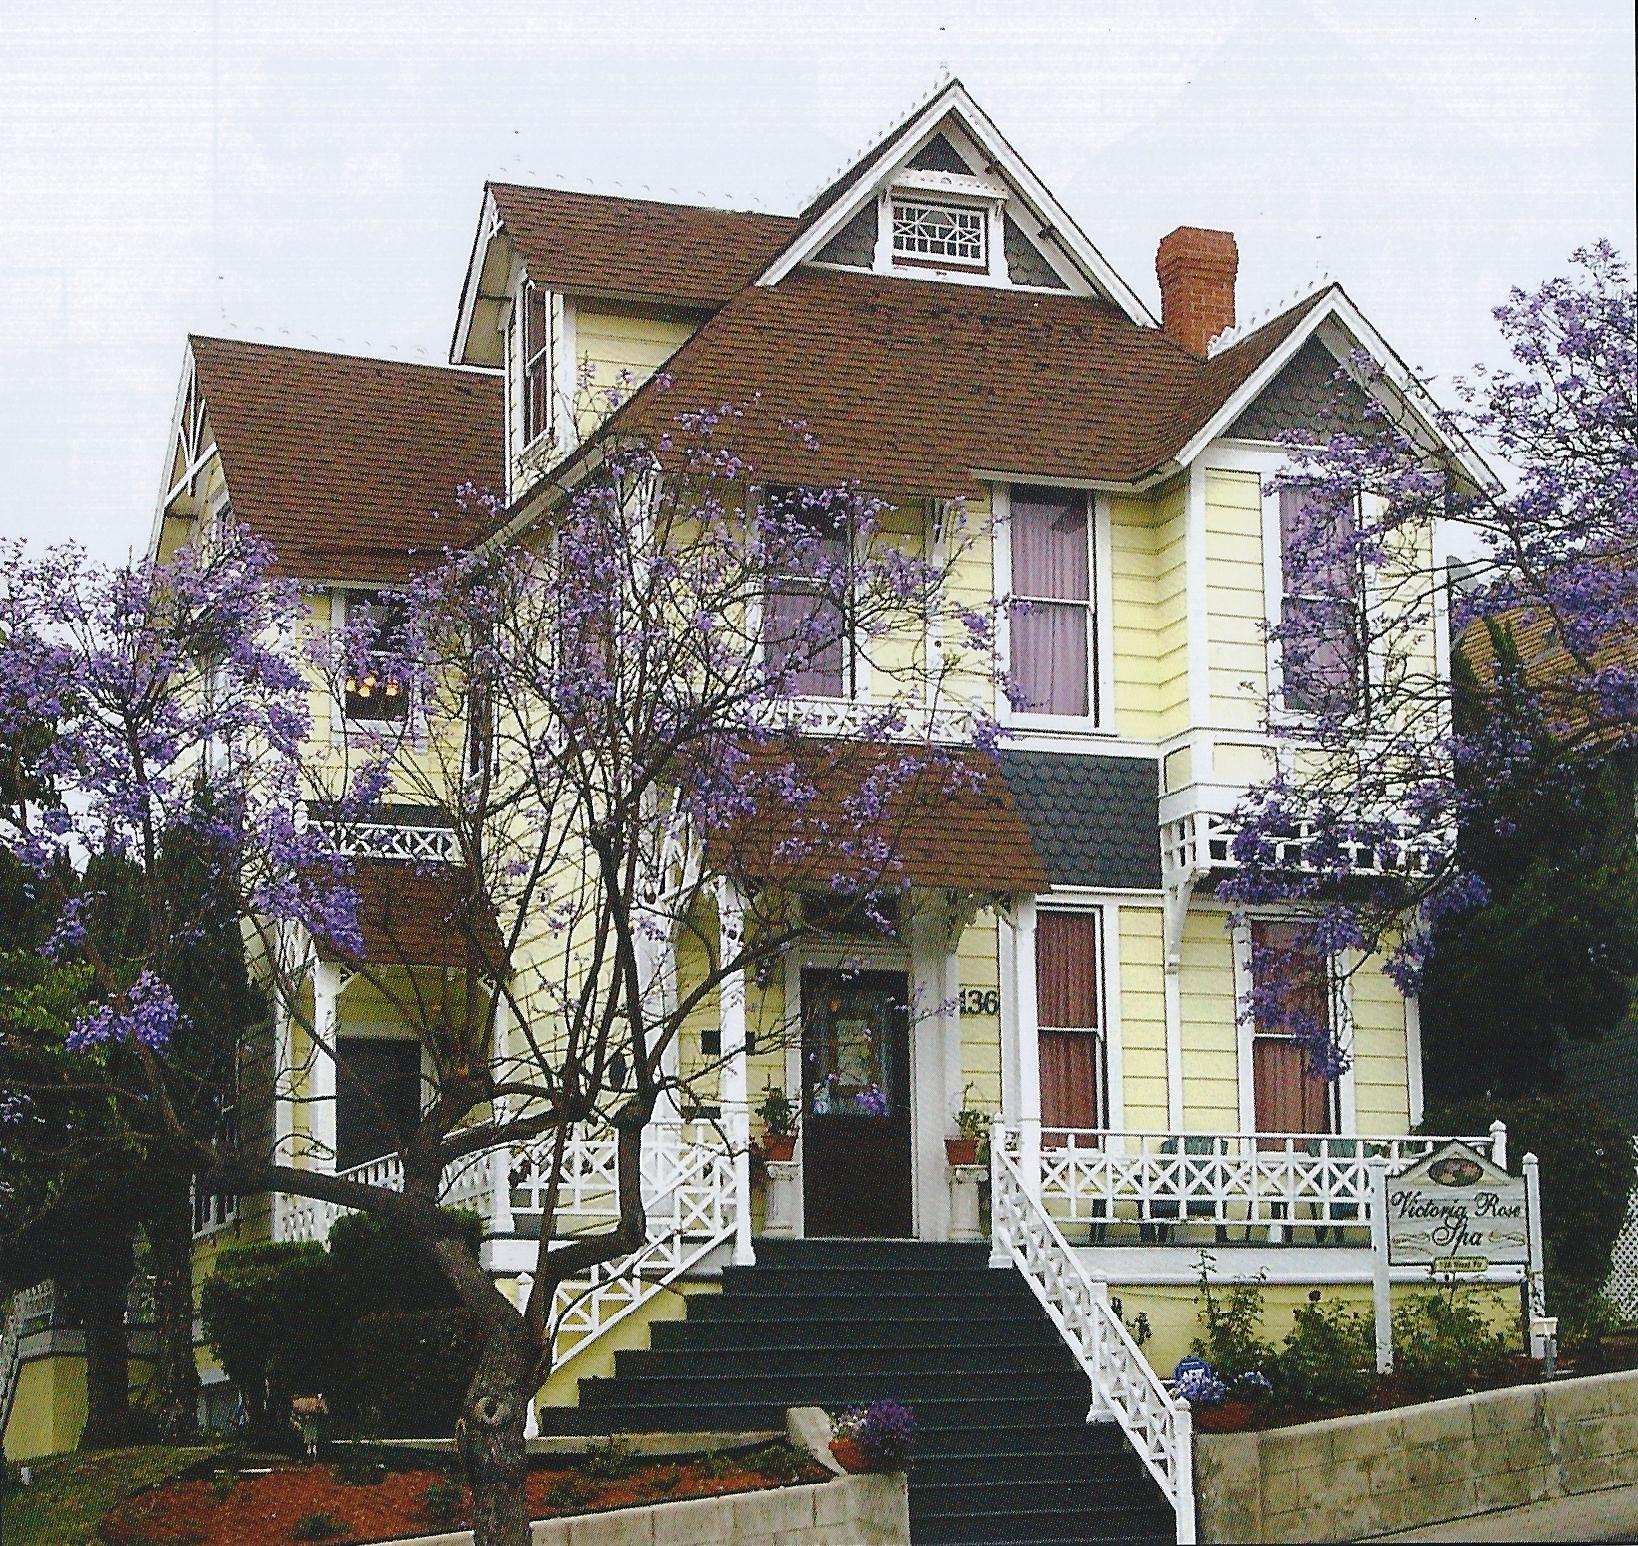 Victoria Rose Spa, 1987-2013